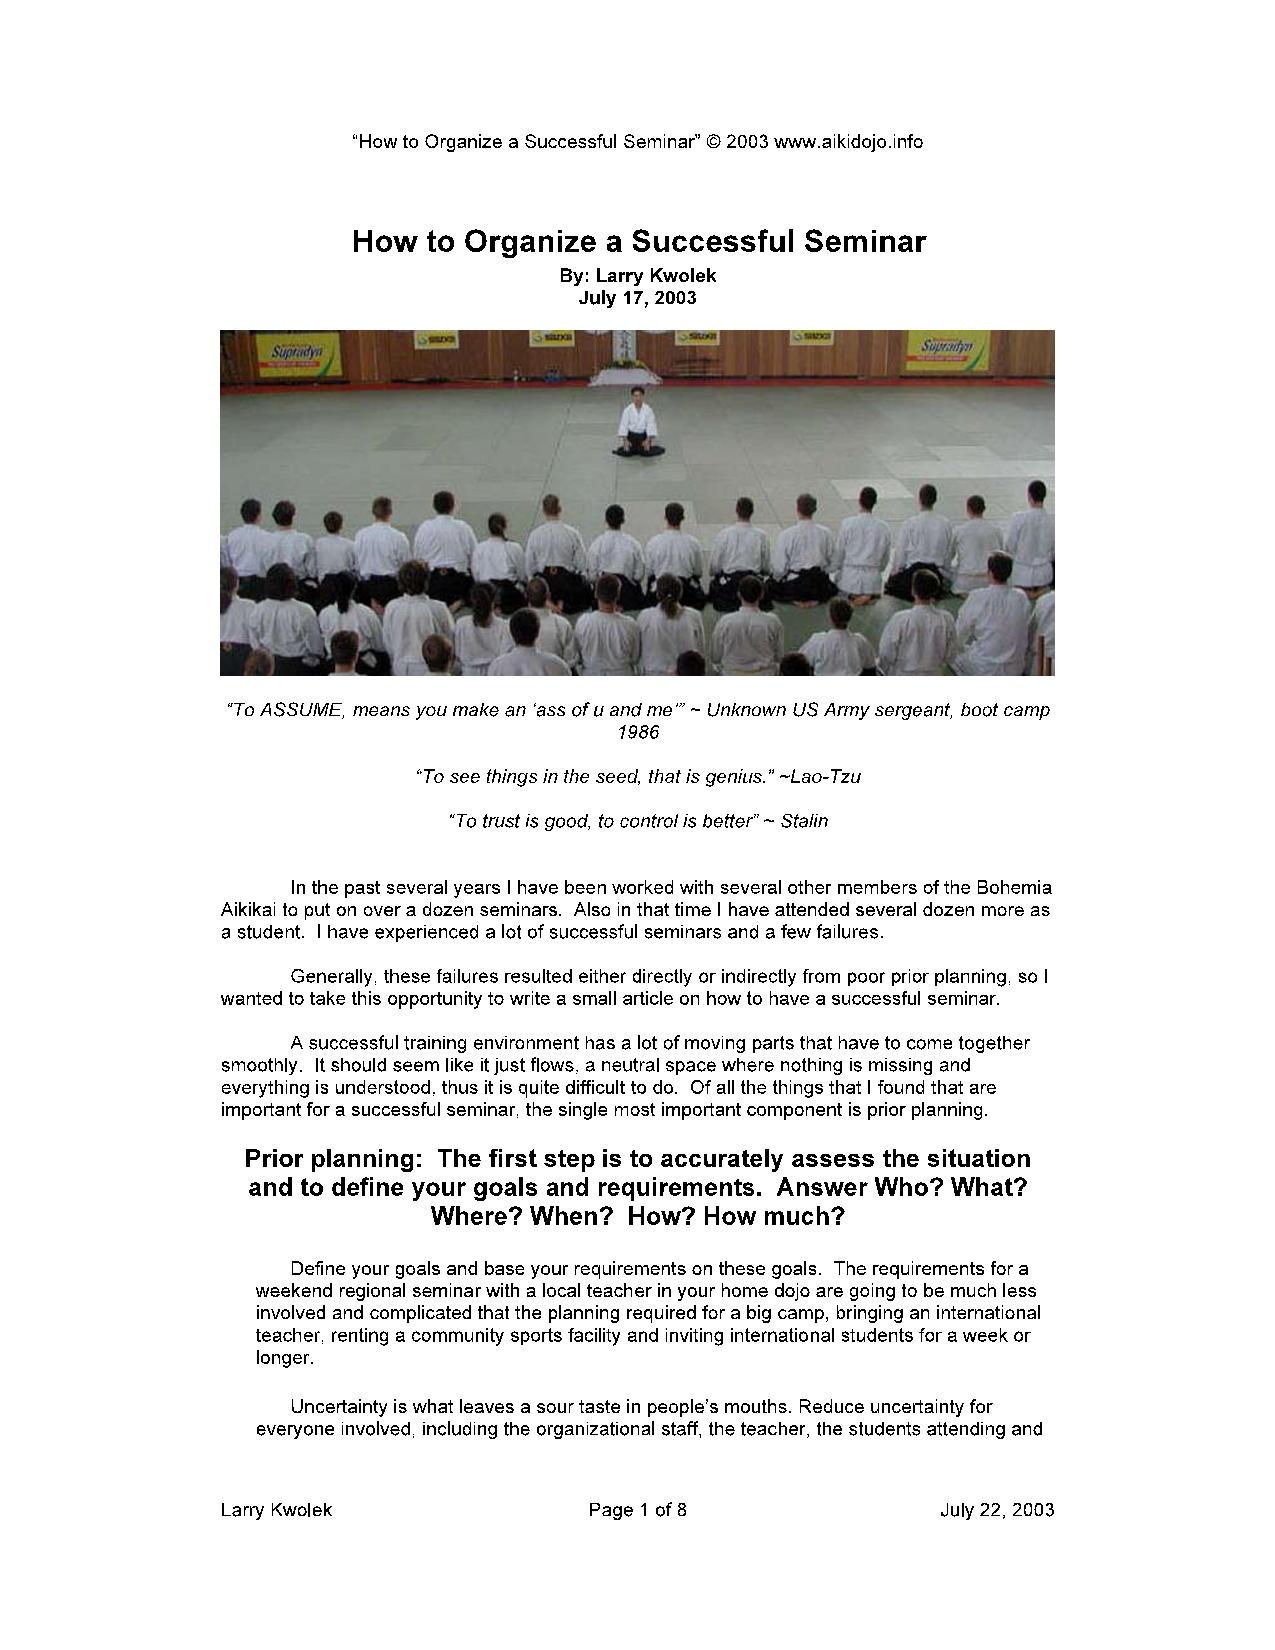 How to Organize a Successful Seminar8